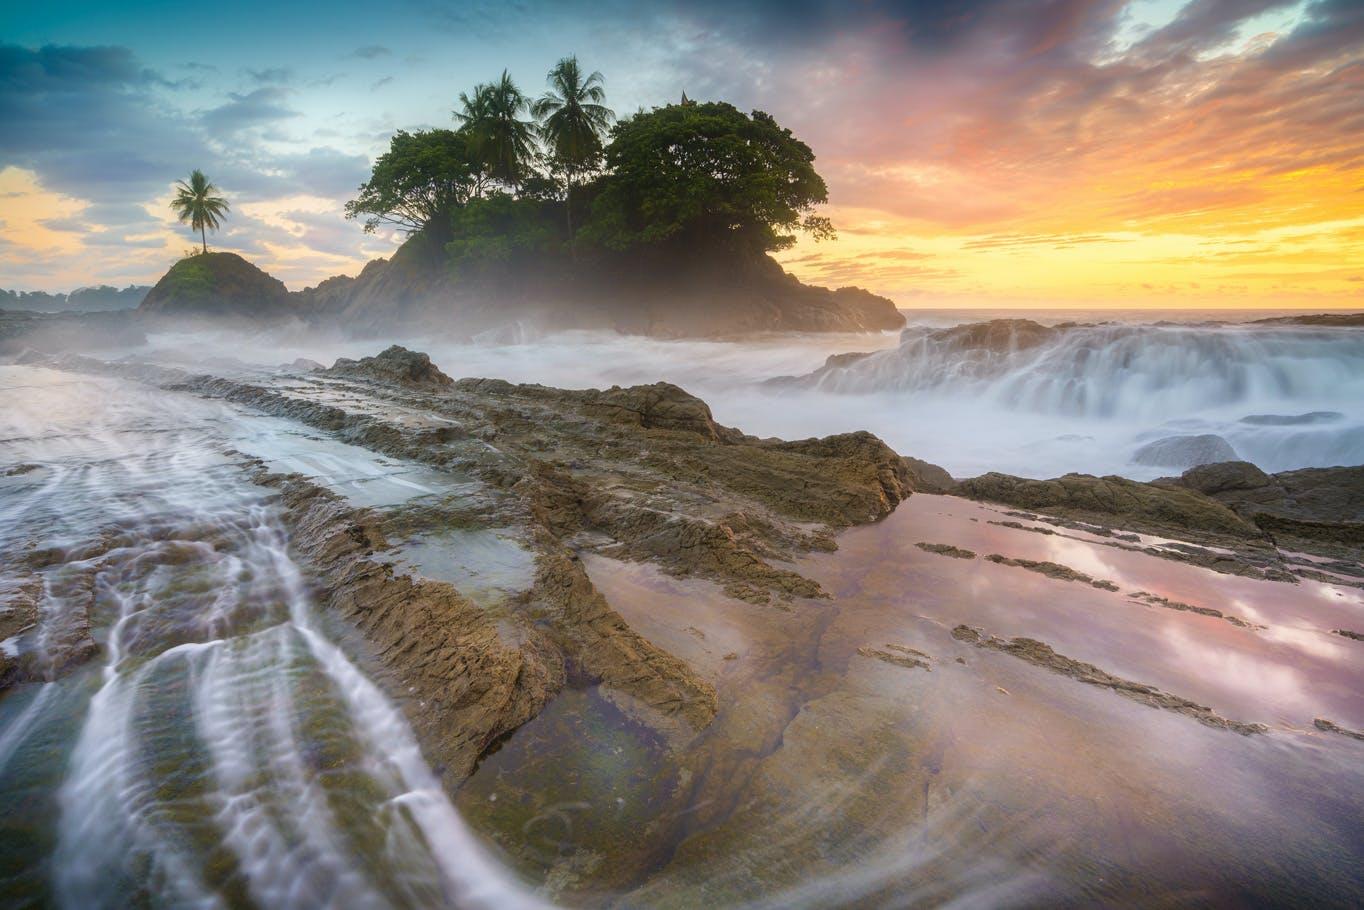 12 Day Costa Rica Wildlife & Landscape Photography Workshop